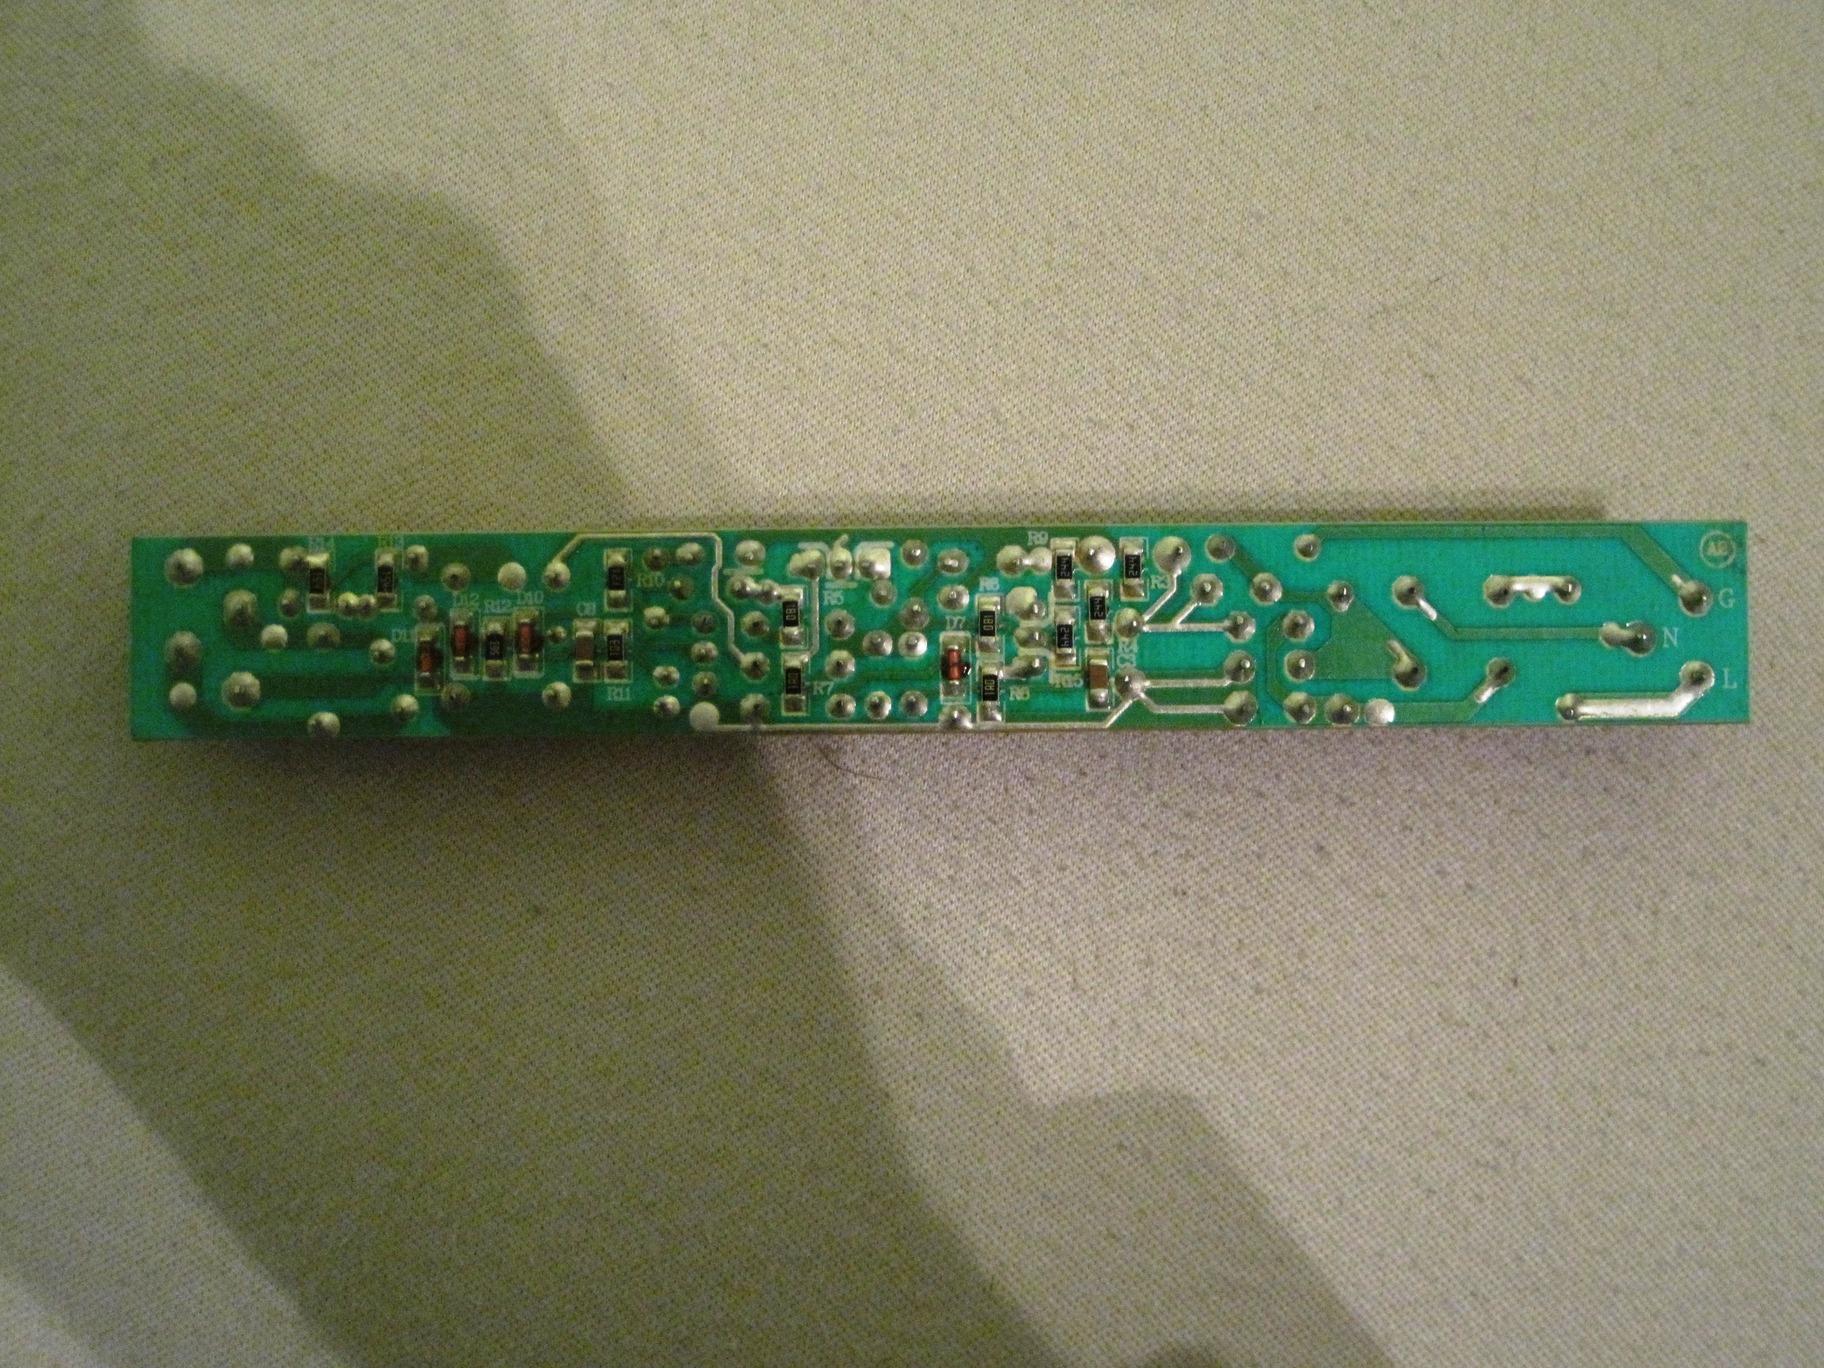 Vorschaltgerät defekt EVG T5 selbst reparieren - Mikrocontroller.net